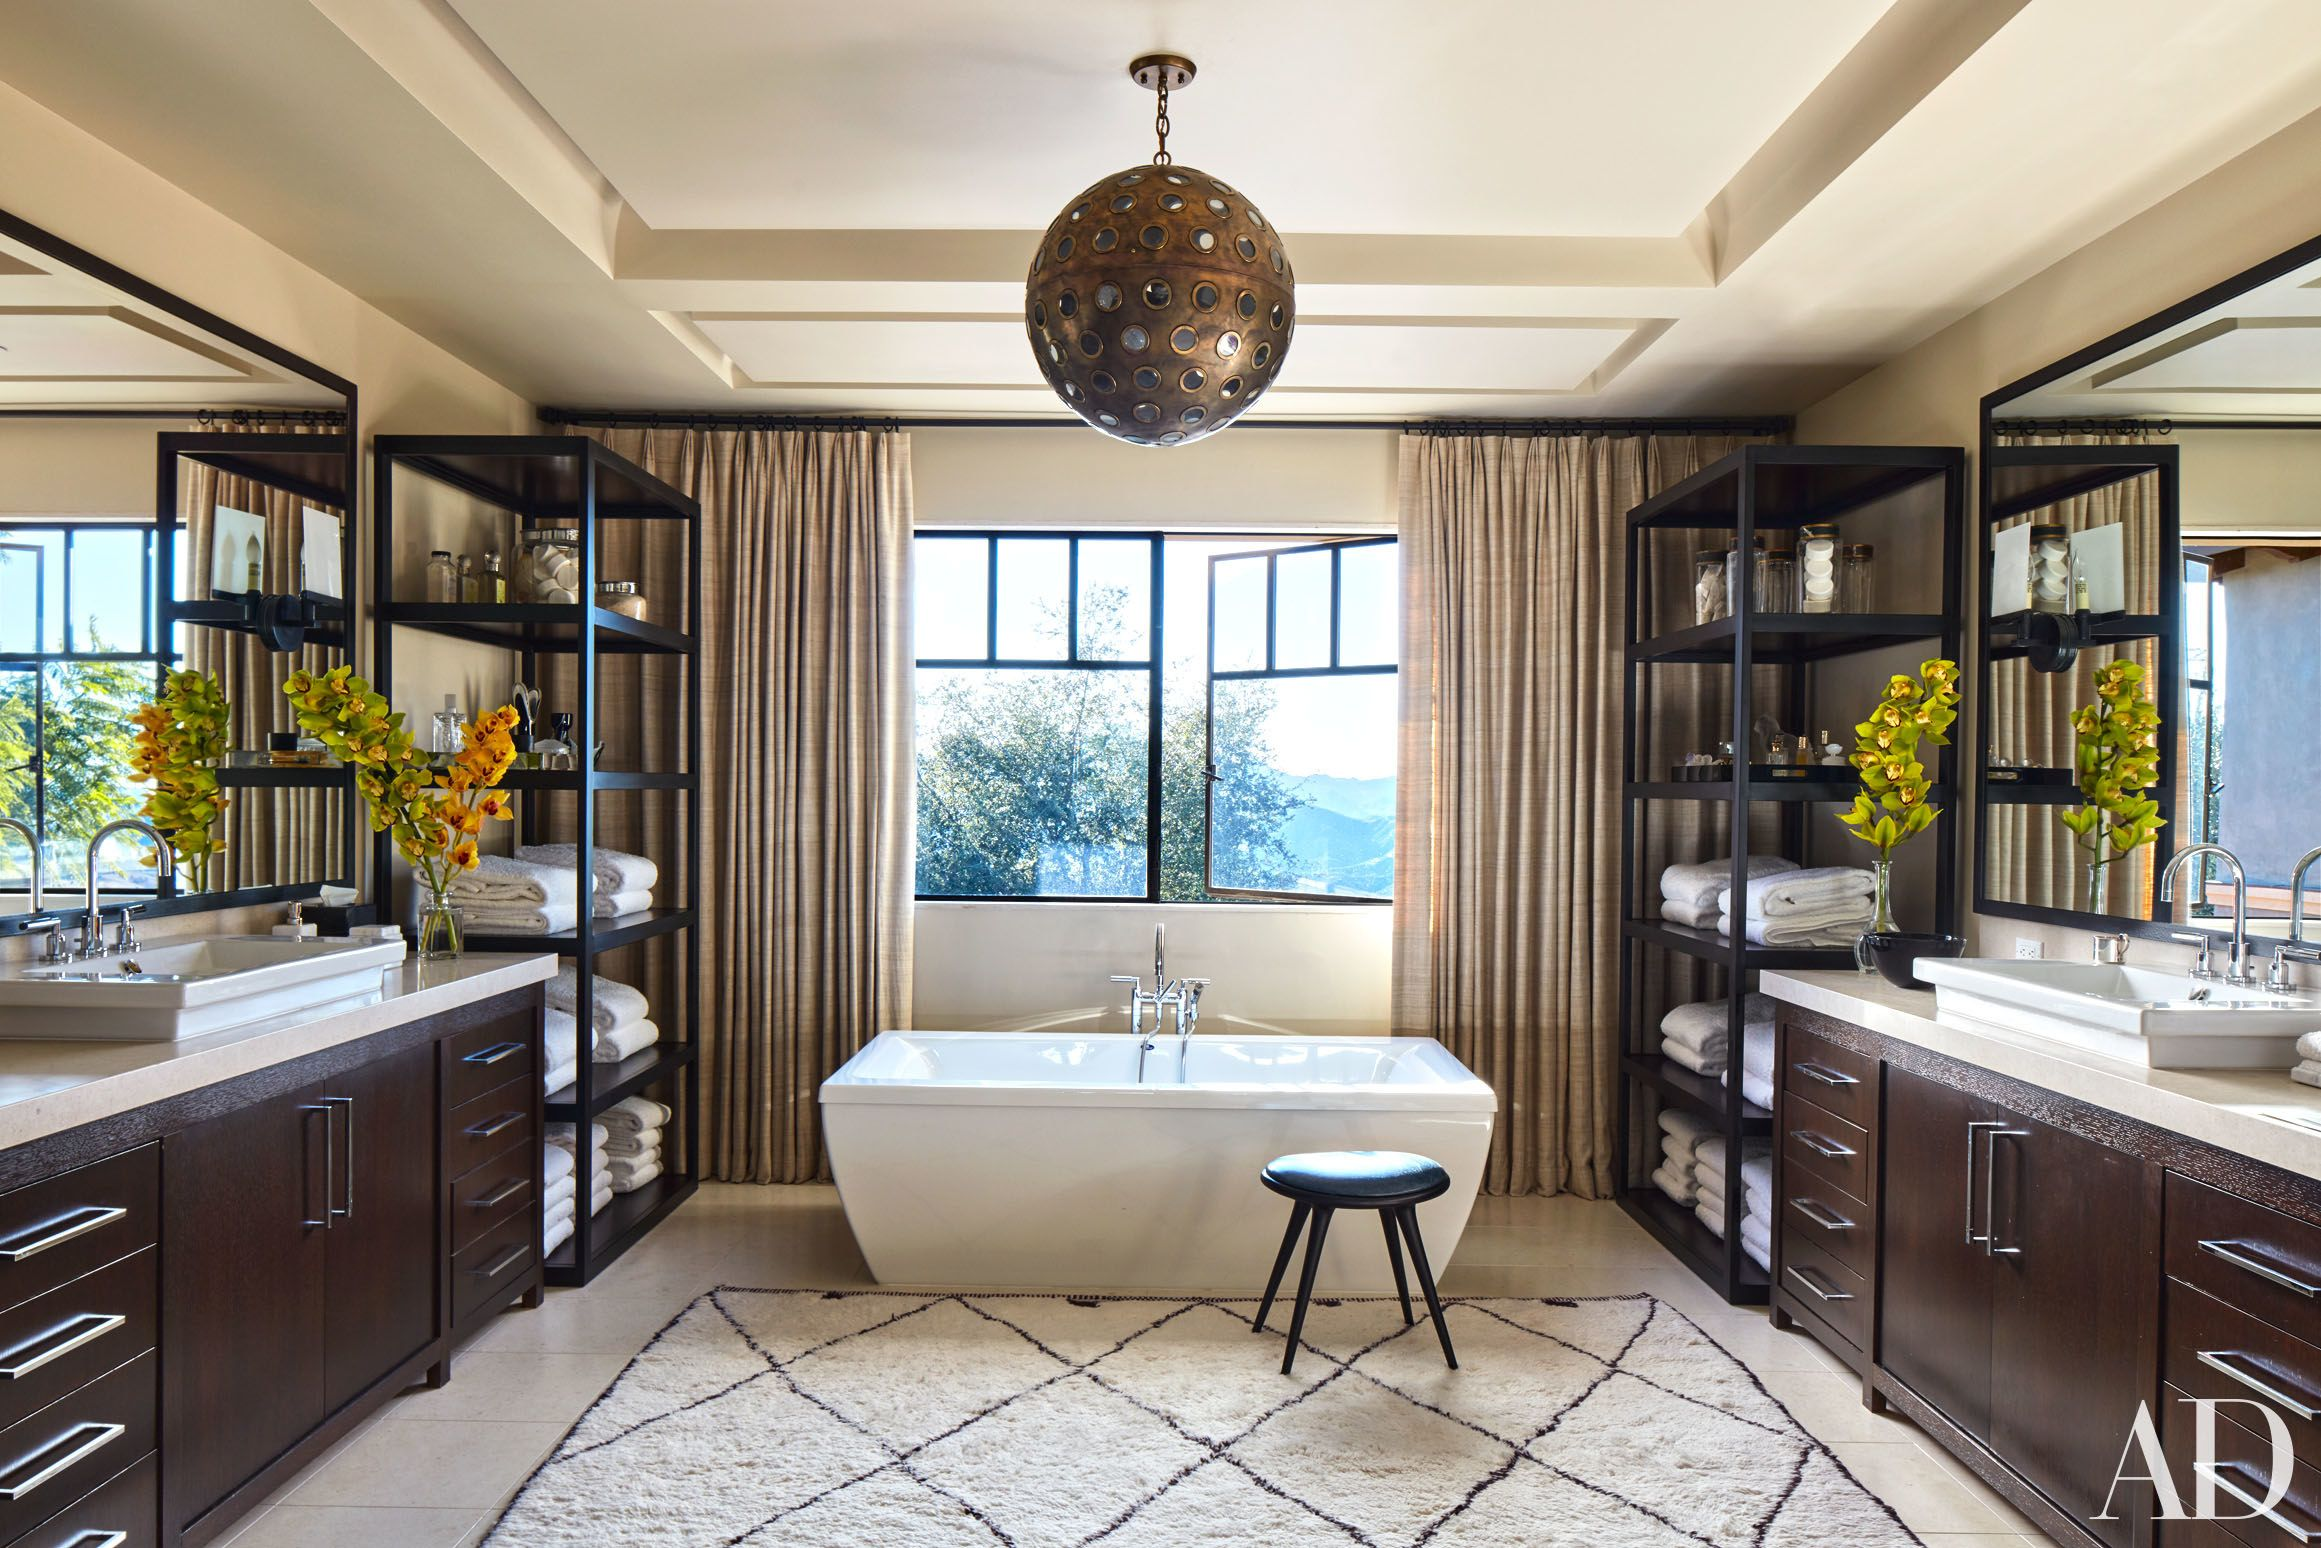 Kourtney kardashian interior design 1000 images about rchitectural kourtney